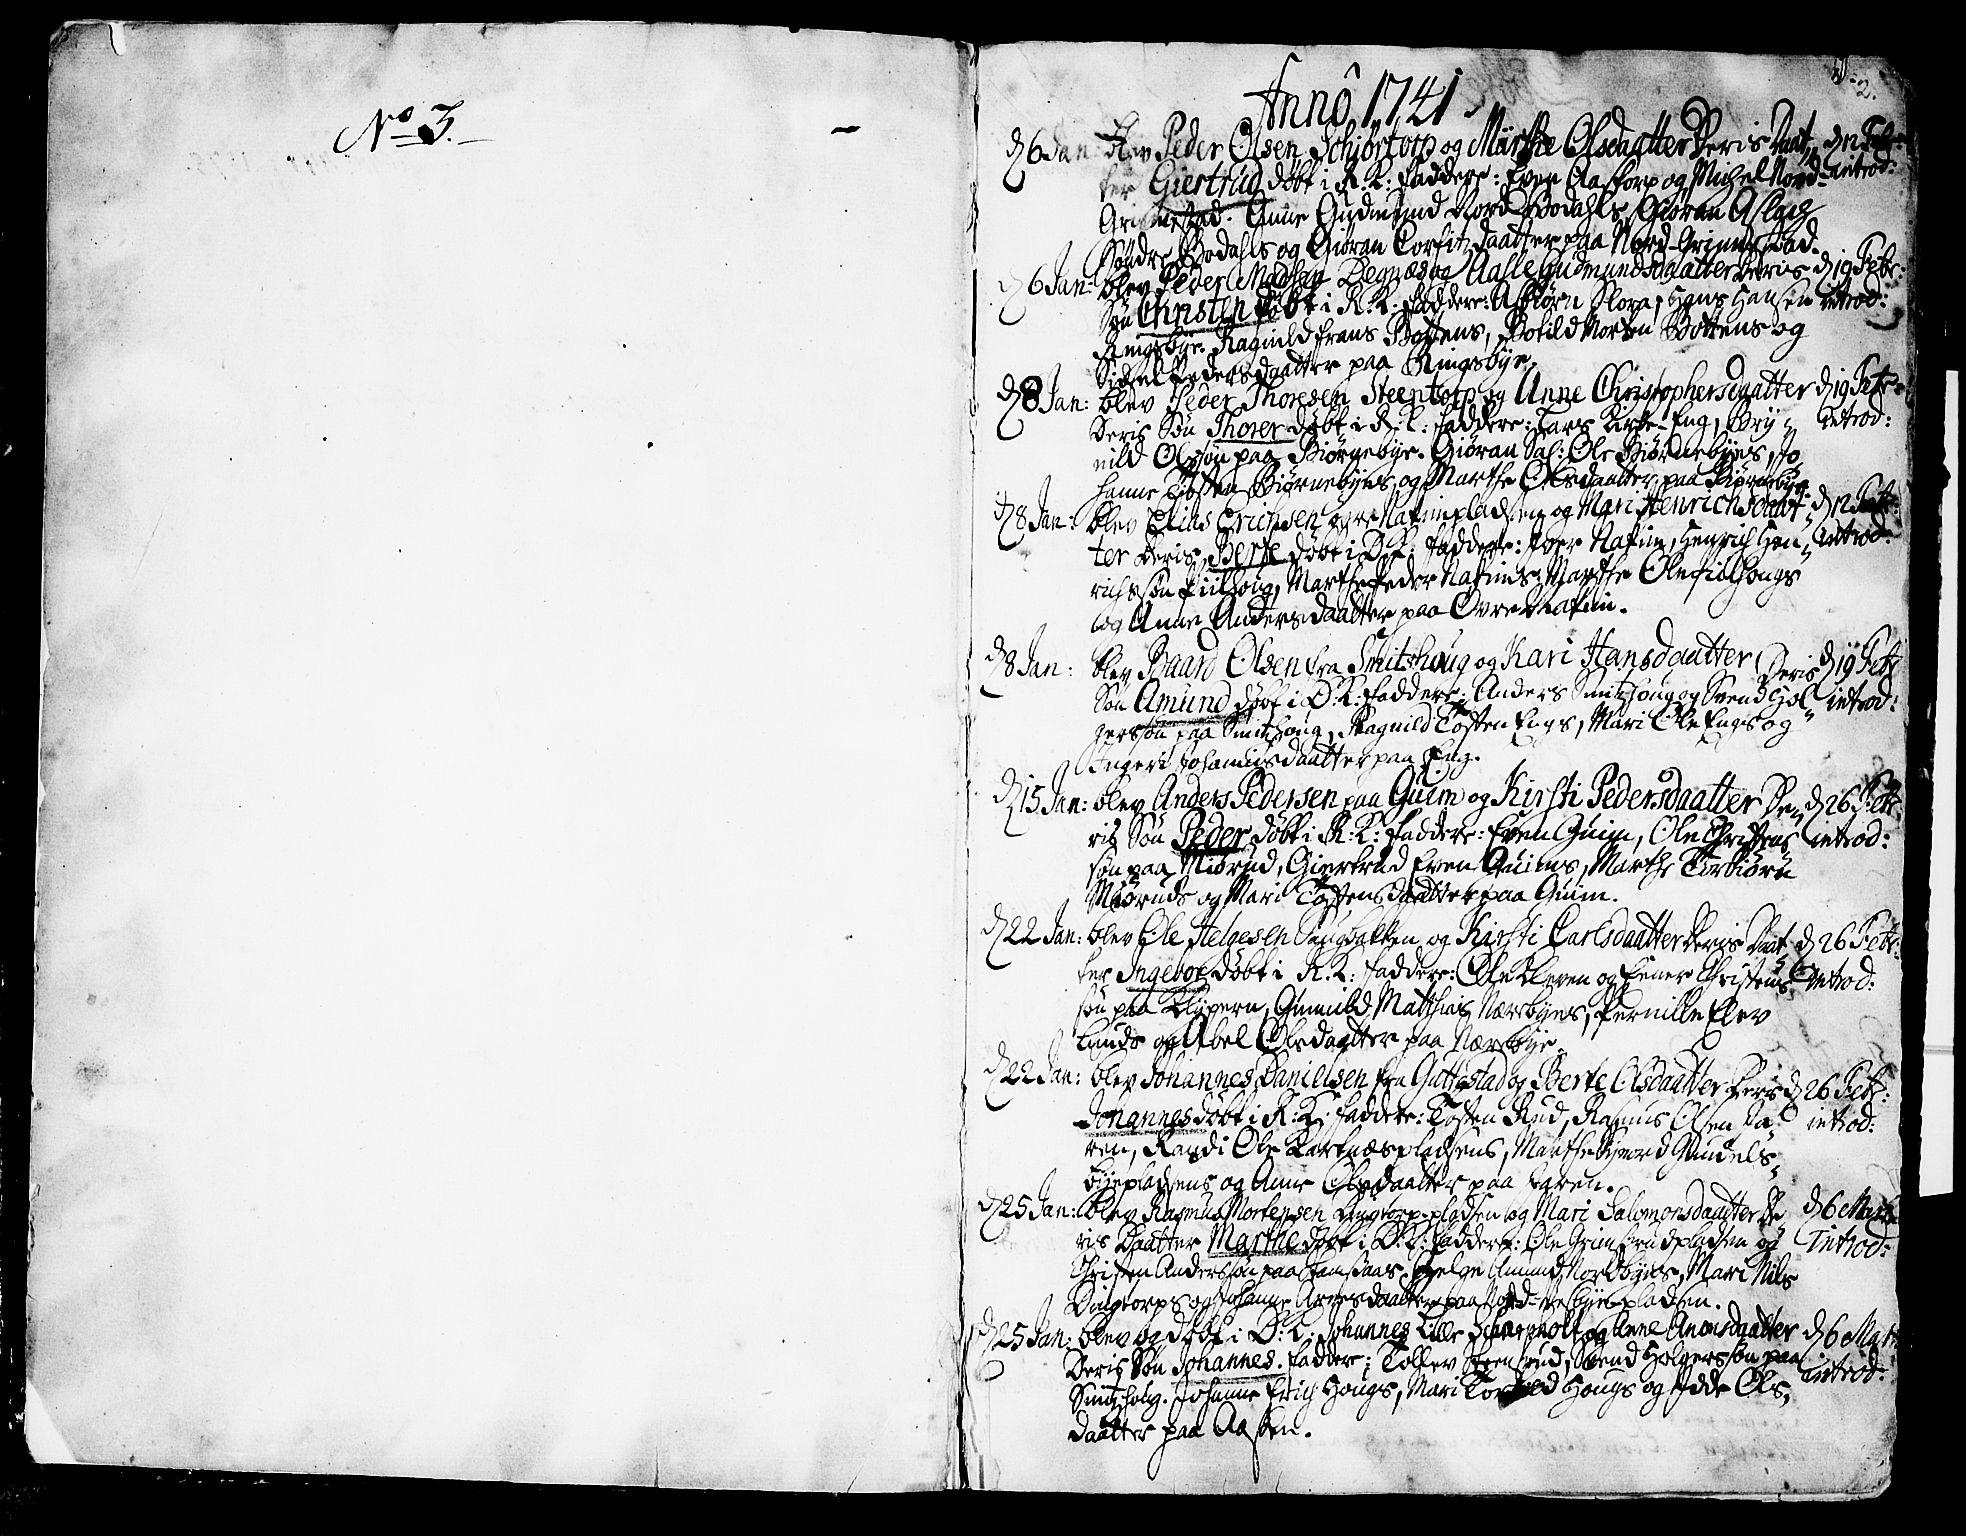 SAO, Rakkestad prestekontor Kirkebøker, F/Fa/L0002: Ministerialbok nr. I 2, 1741-1751, s. 2